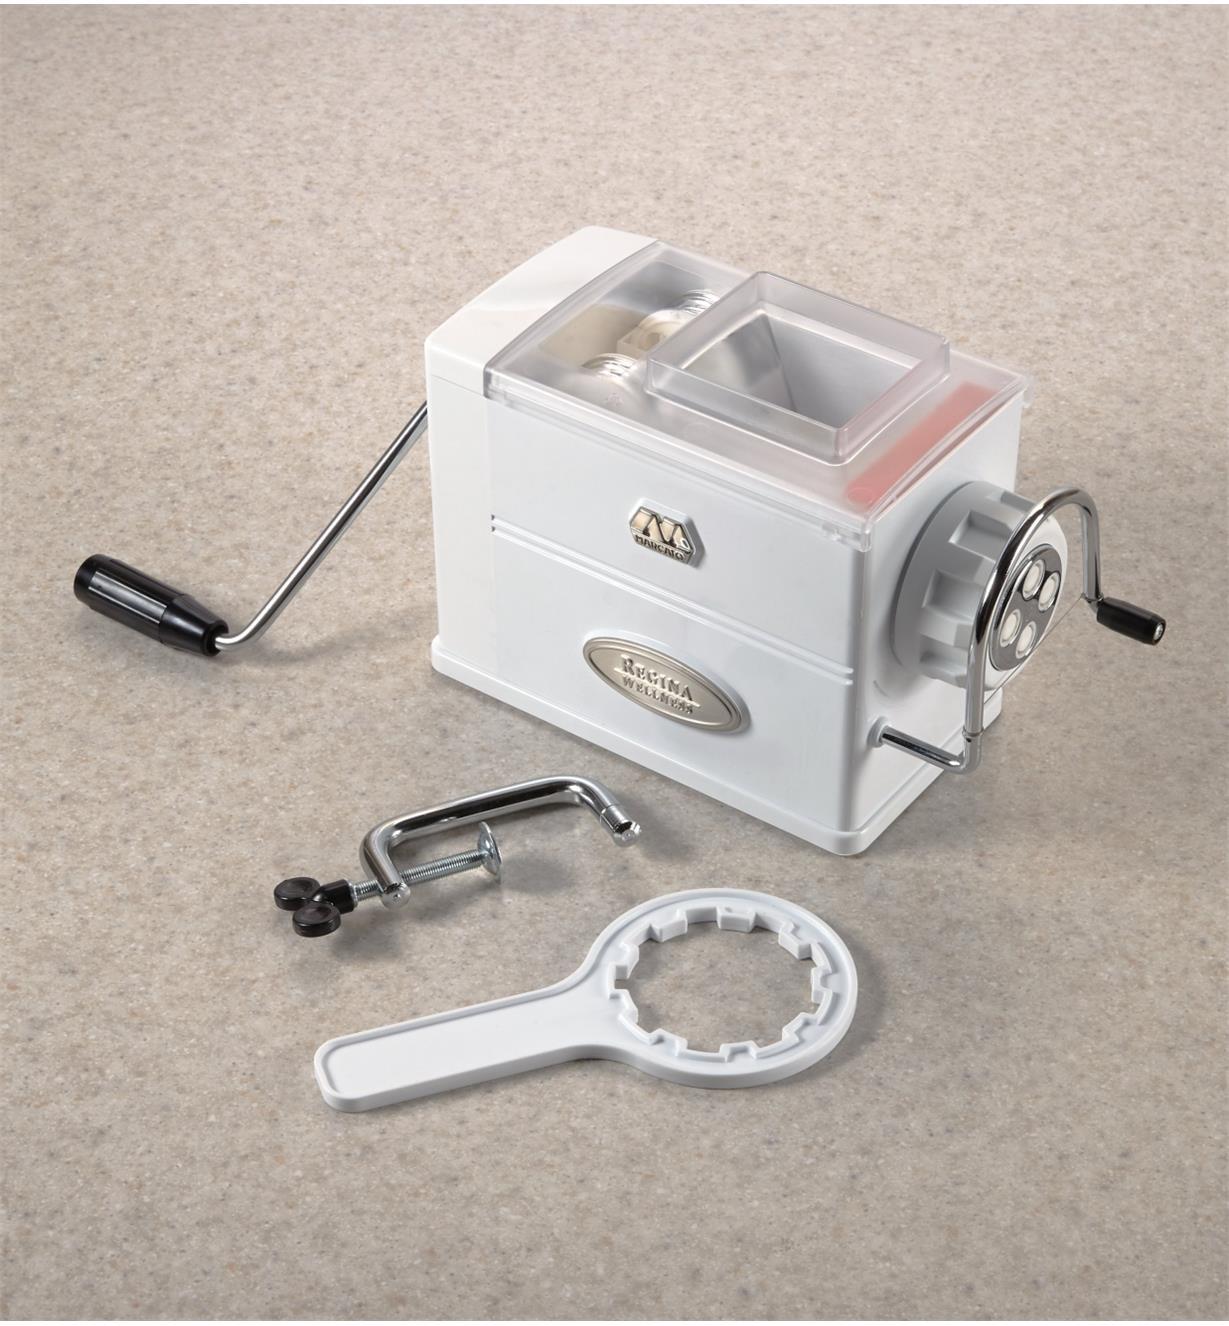 EV312 - Marcato Pasta Extruder